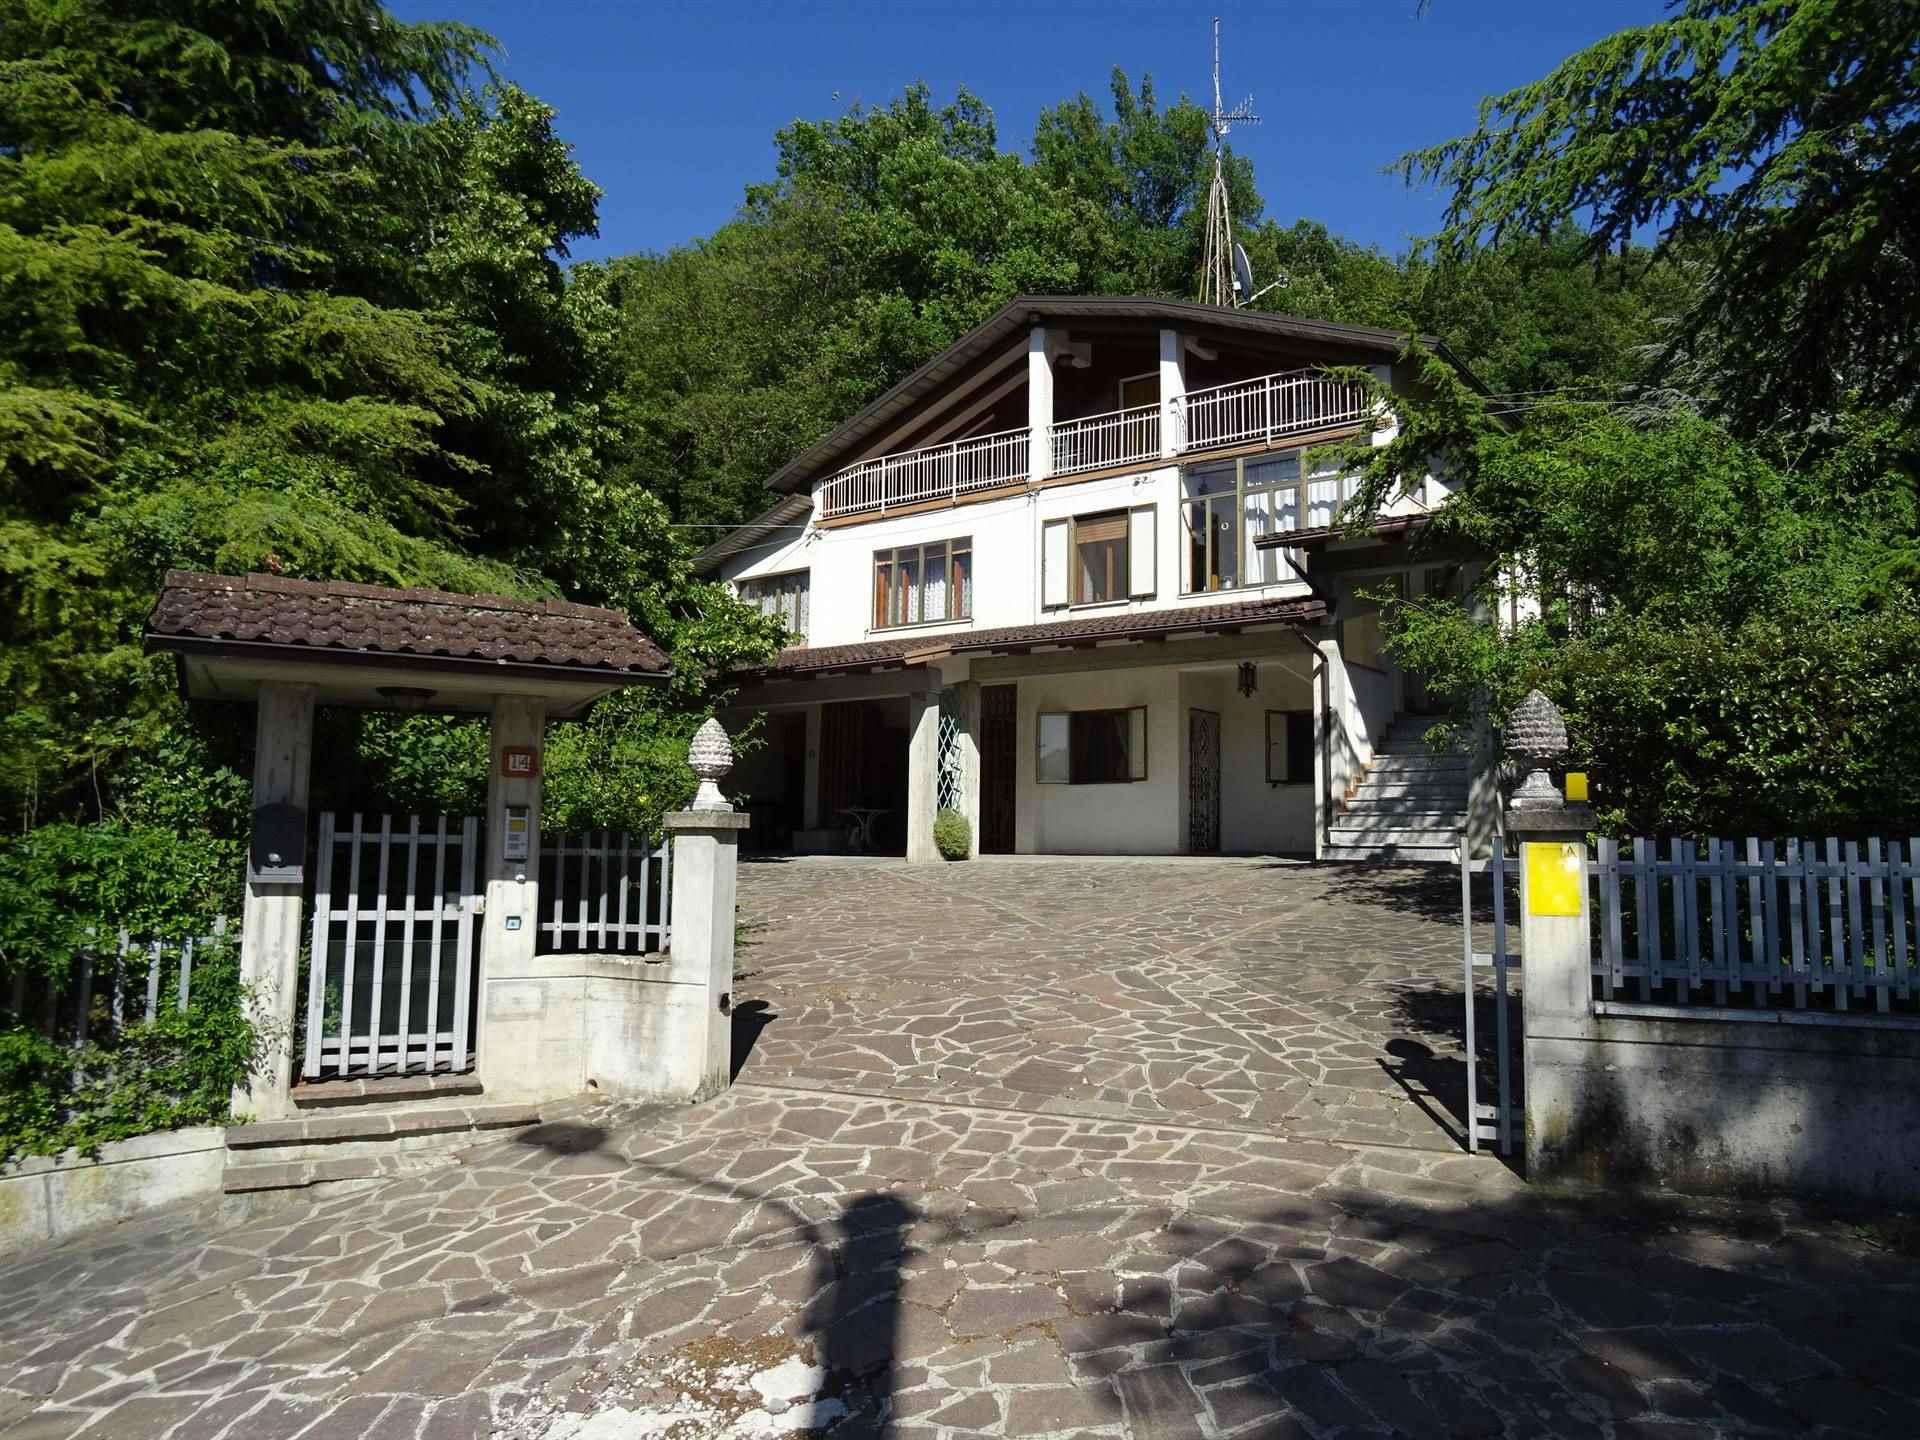 PALAGANO - MODENA